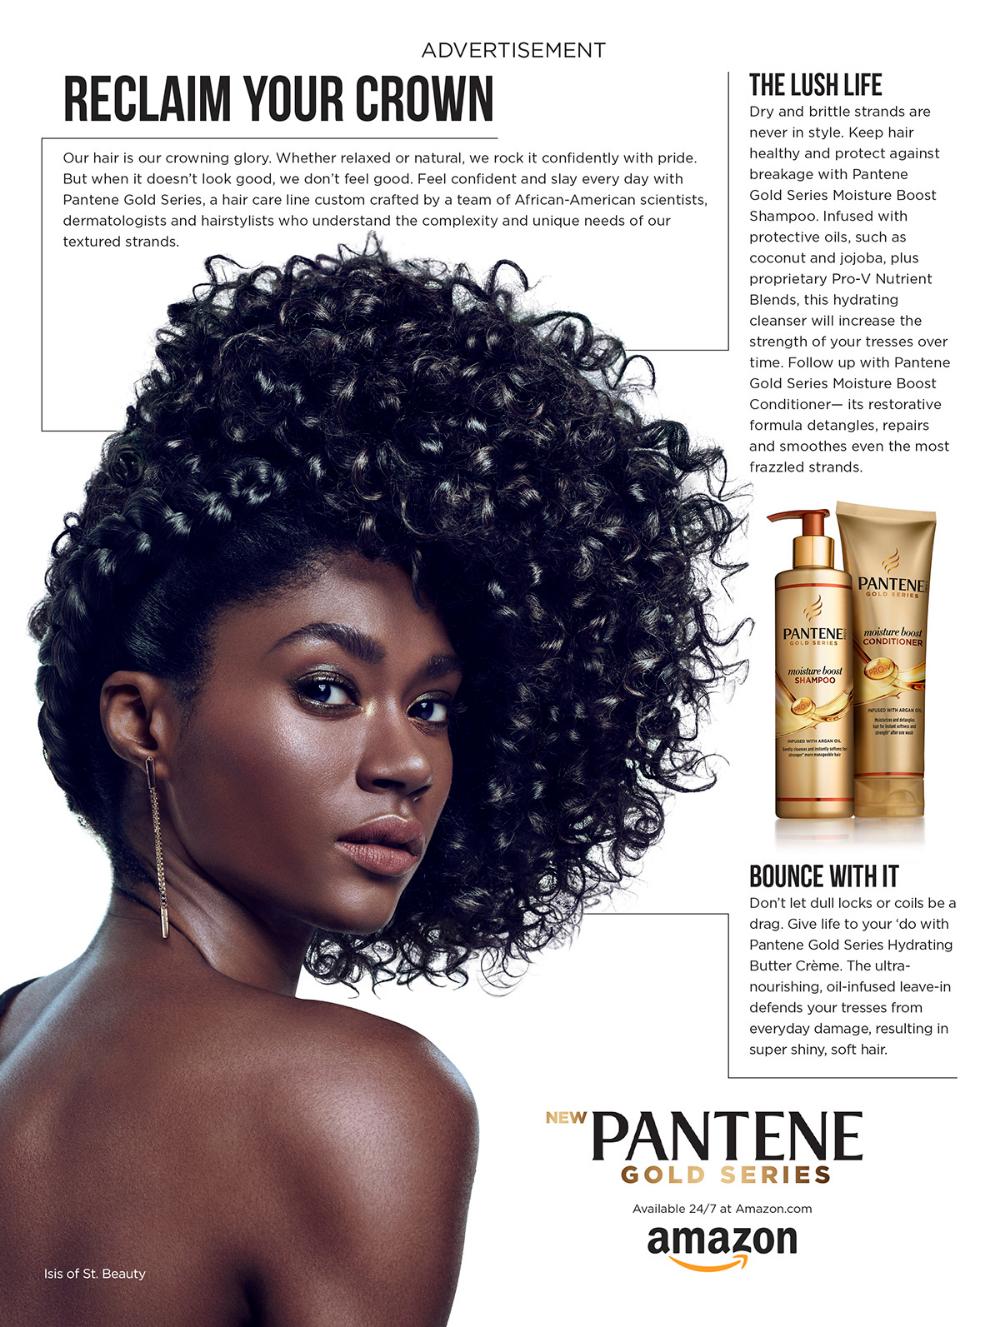 Pantene/Ebony on Behance in 2020 Pantene gold series